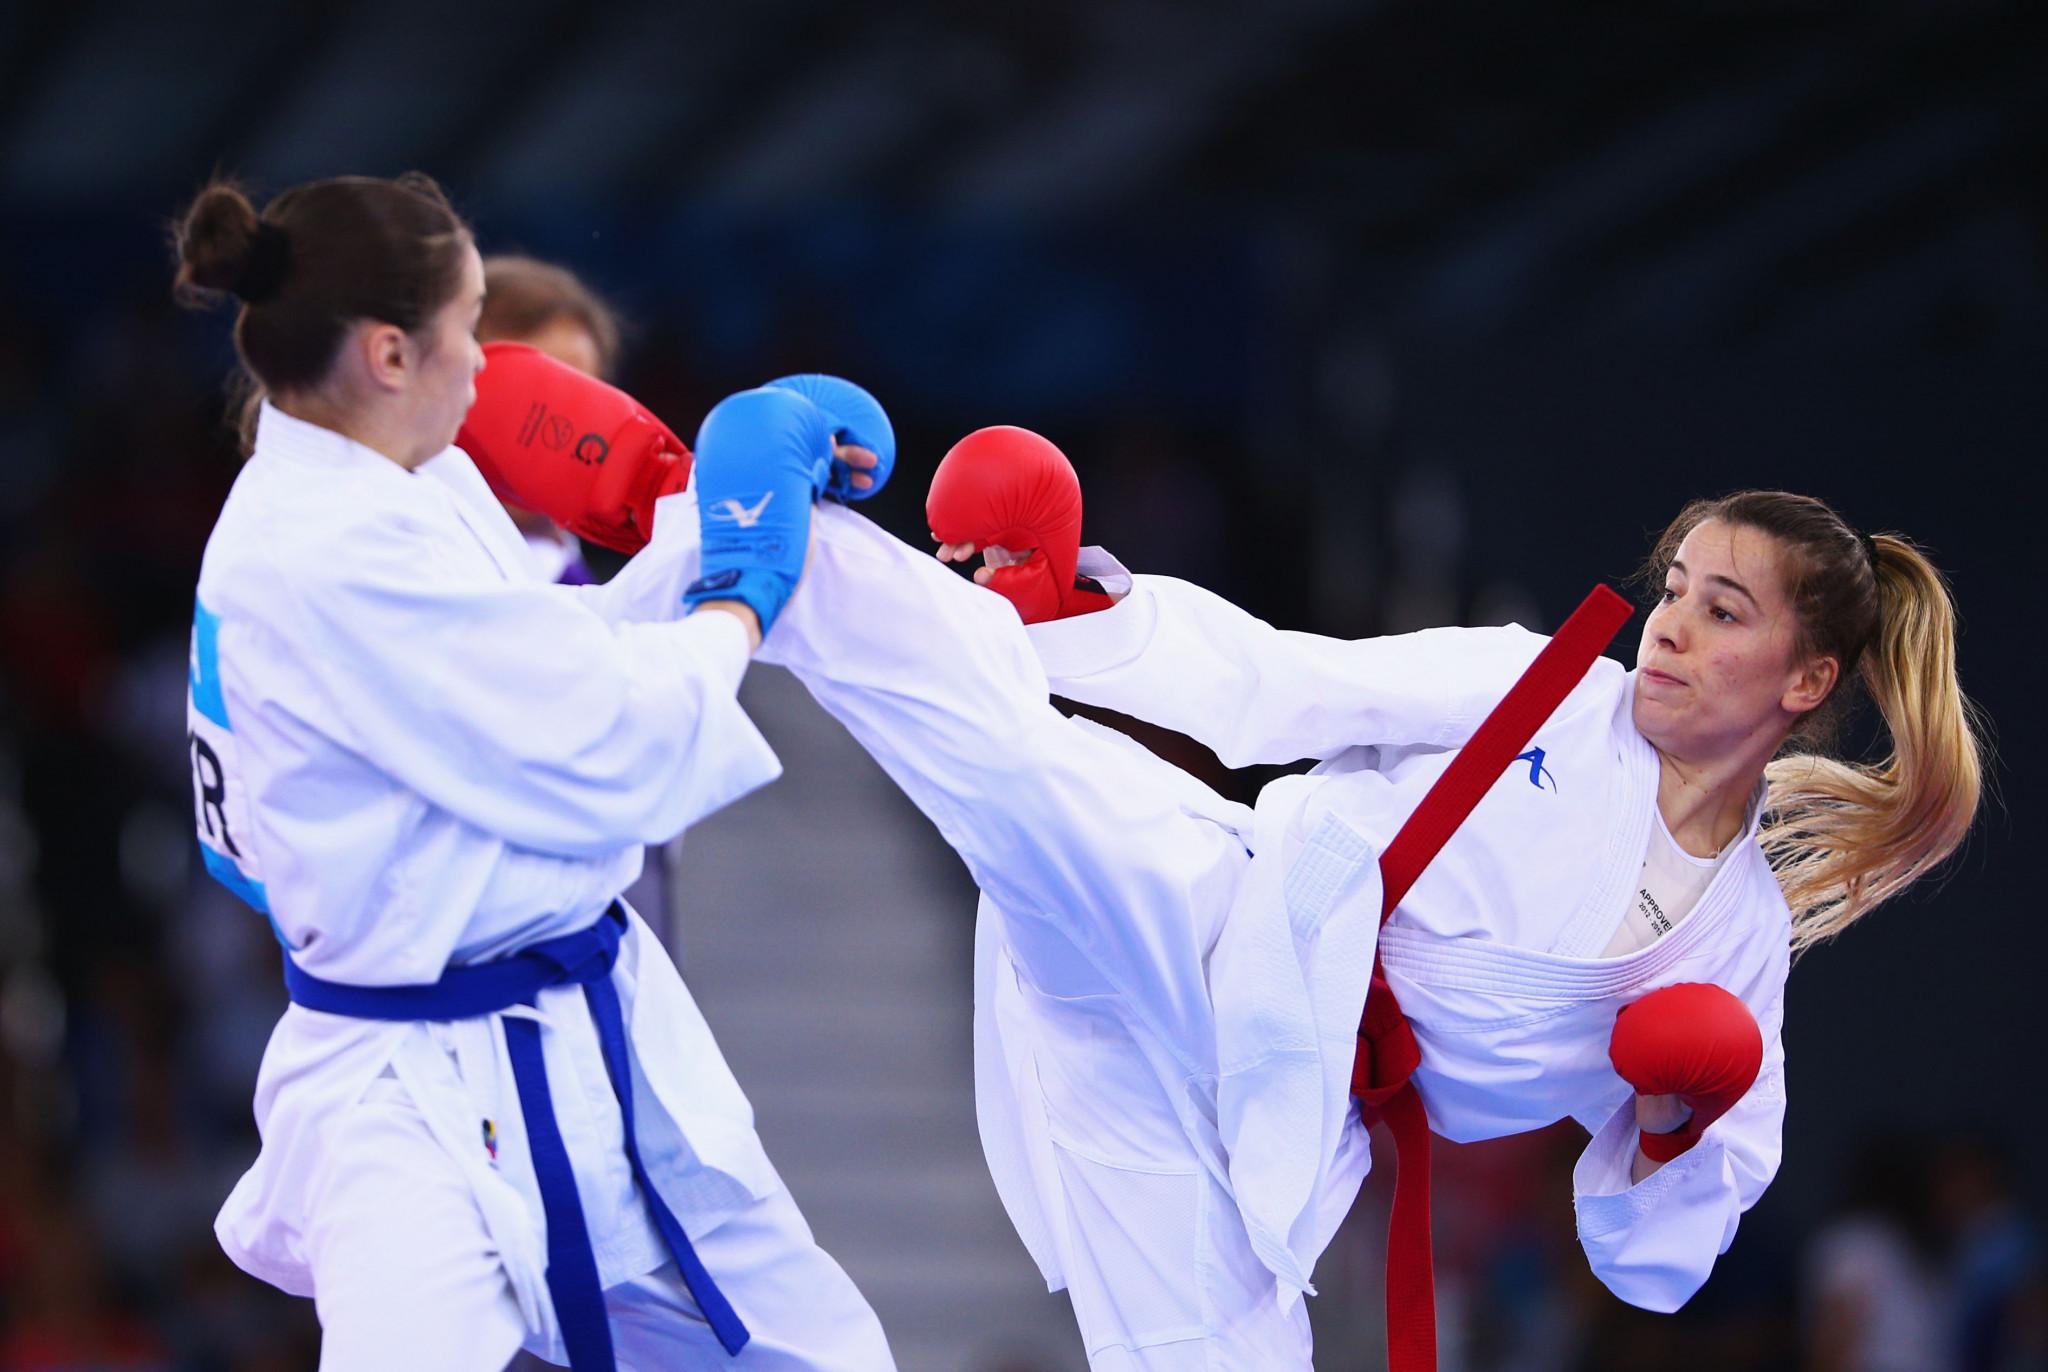 Guadalajara to host record-breaking Karate 1-Series A event